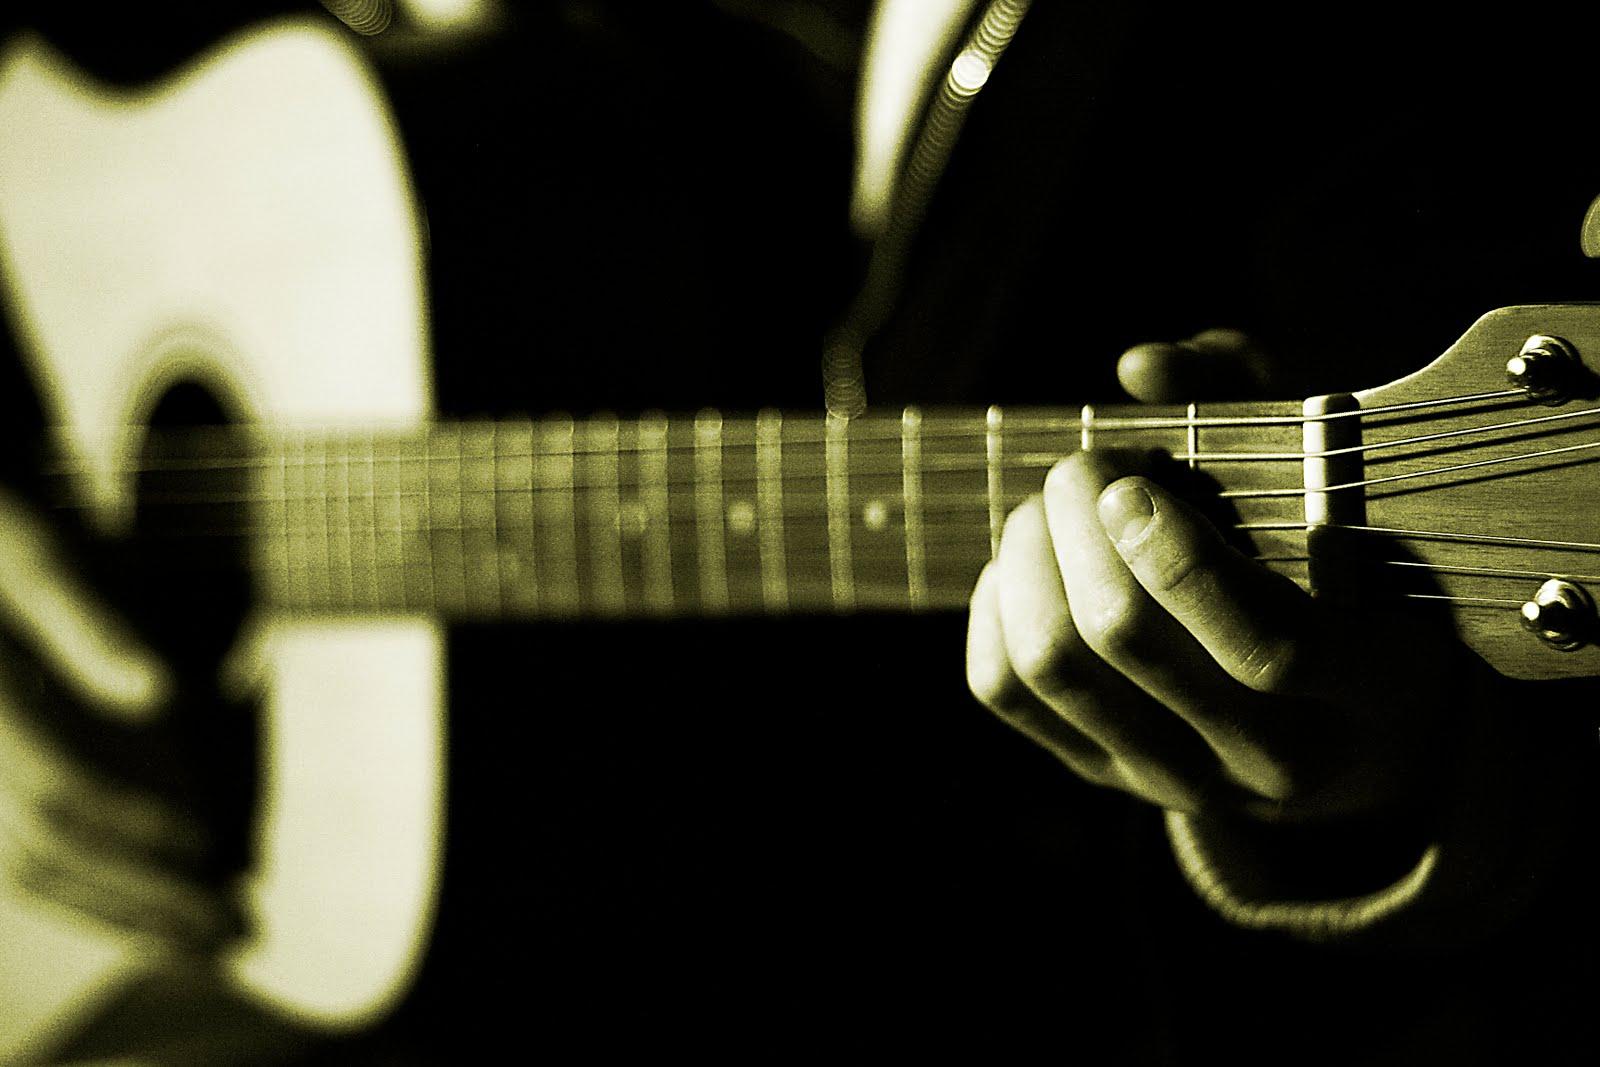 The time I burned my guitar it was like a sacrifice. You sacrifice the things you love. I love my g